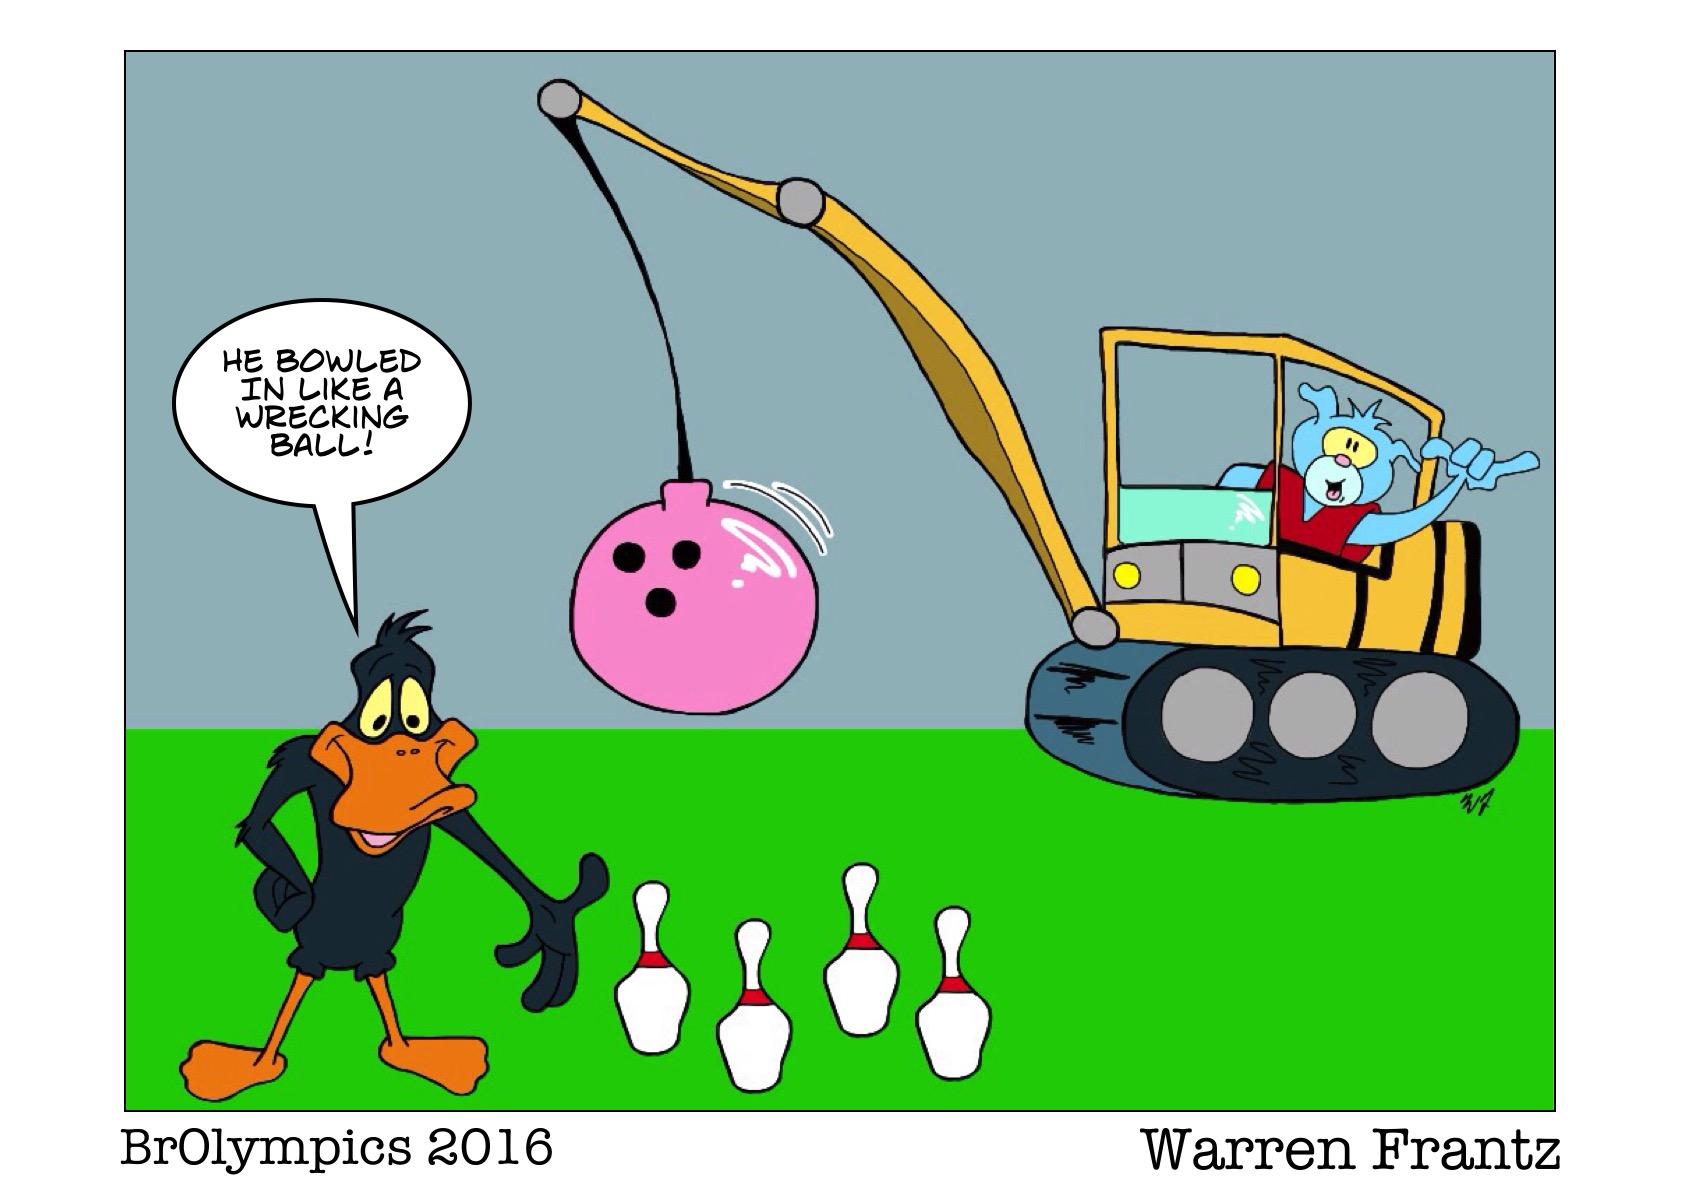 BrOlympics Bowling